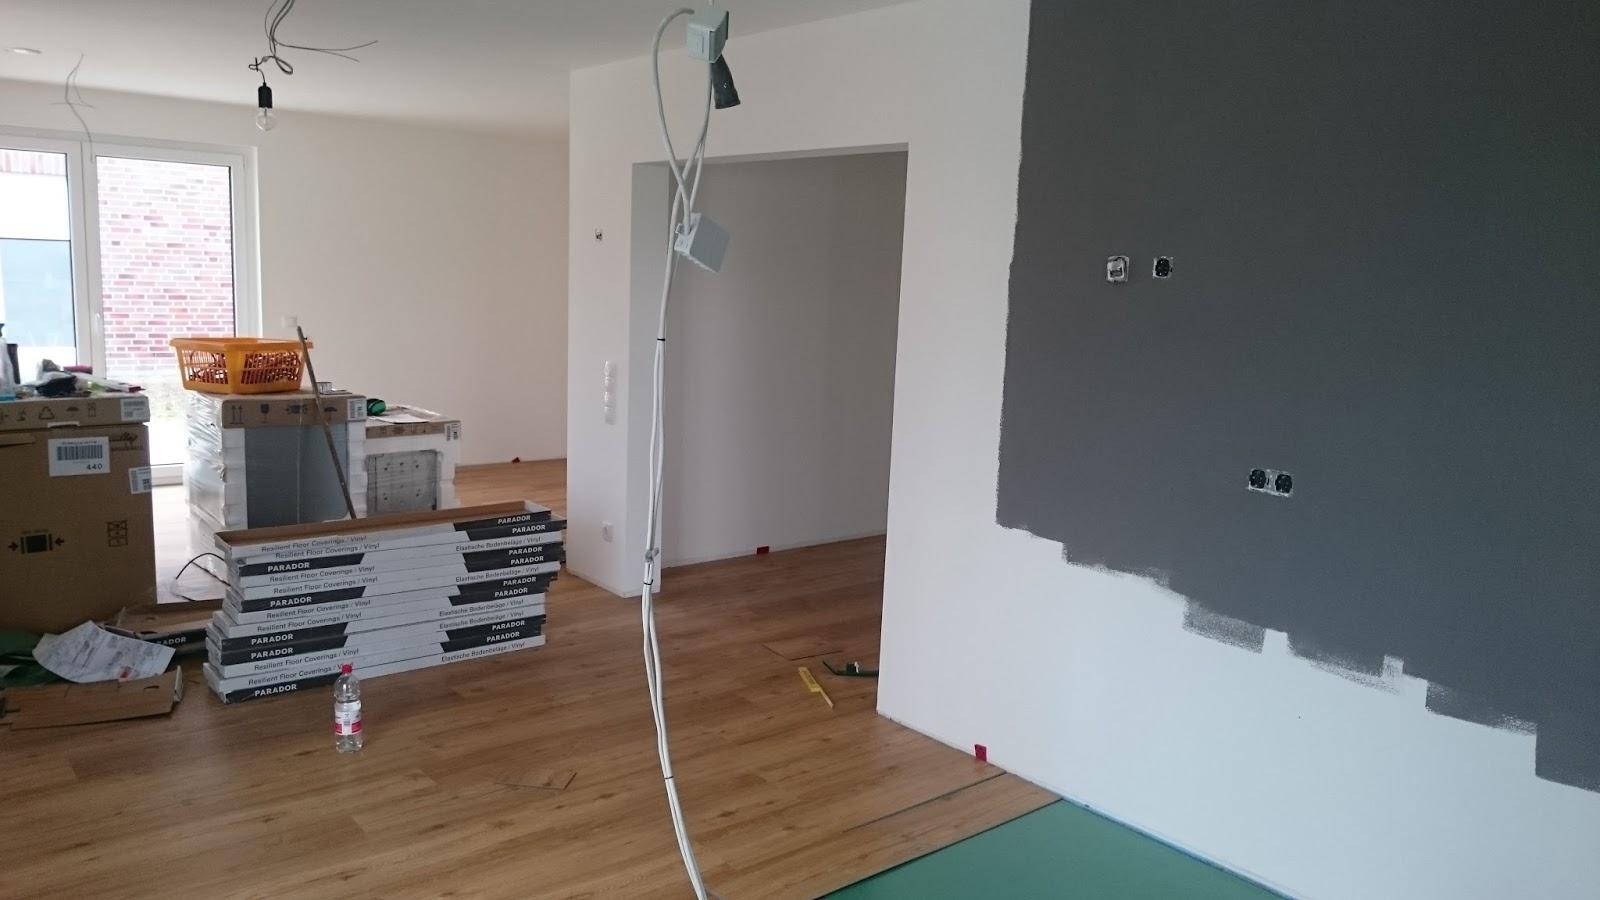 stadtvilla in elmenhorst klick f r klick der vinyl fu boden entsteht. Black Bedroom Furniture Sets. Home Design Ideas